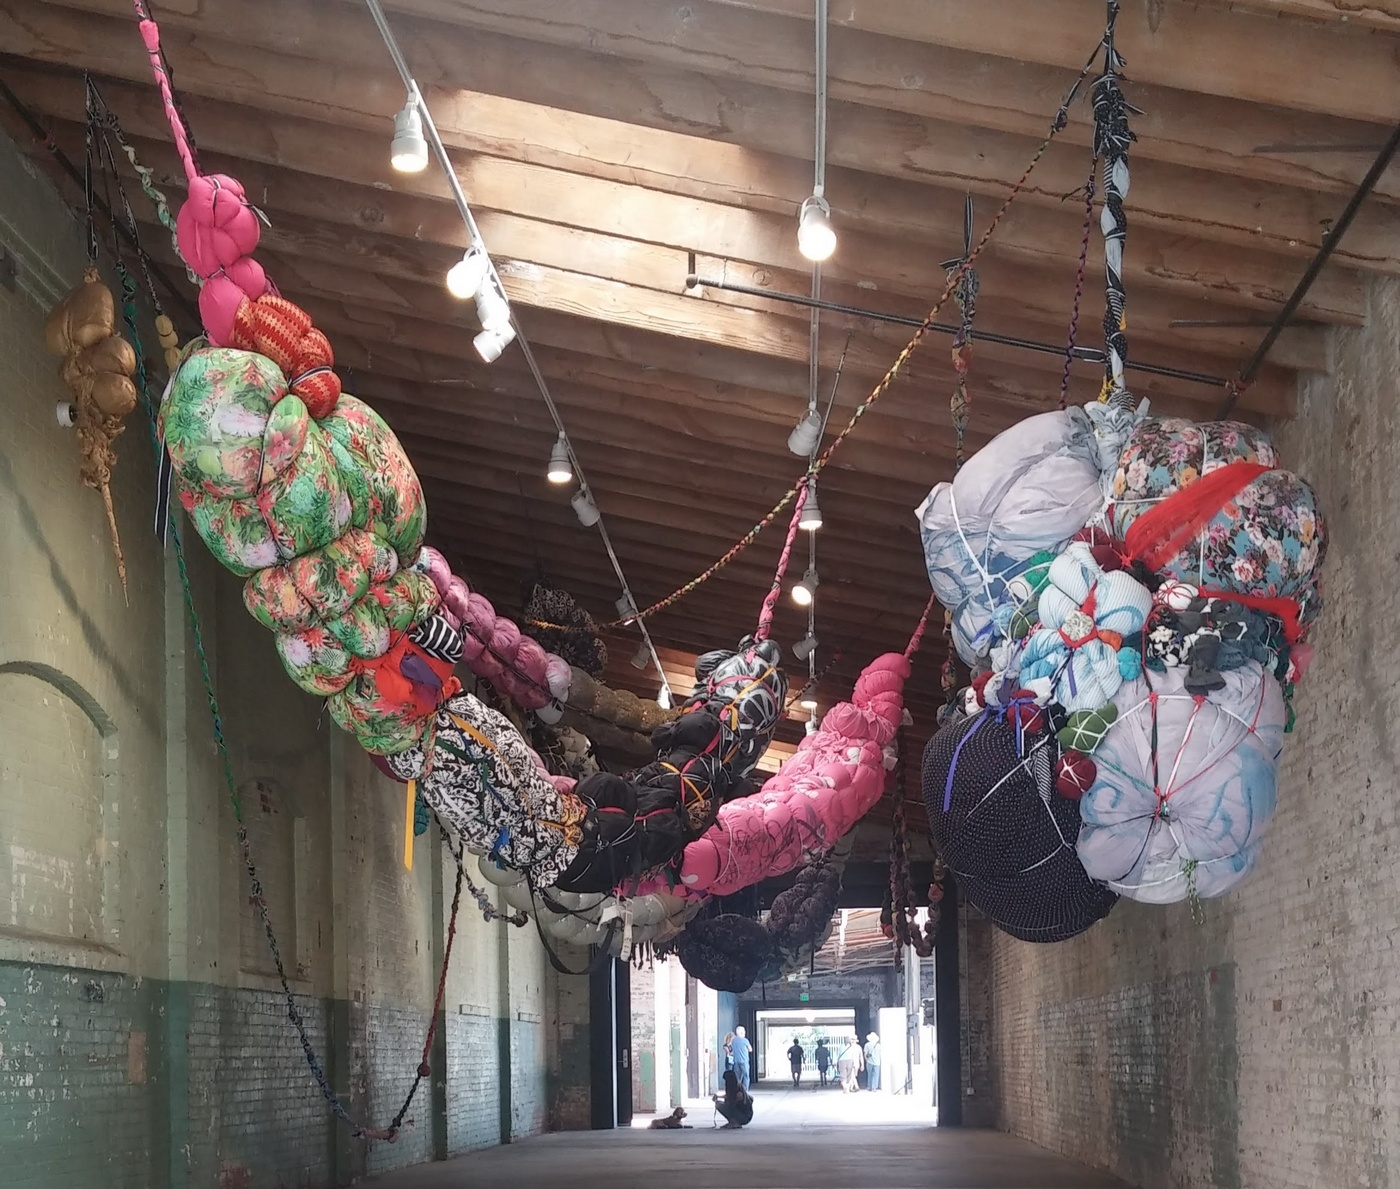 Hauser Wirth & Schimmel | Forgiving Strands, Shinique Smith, artist - New York, EDGExpo.com